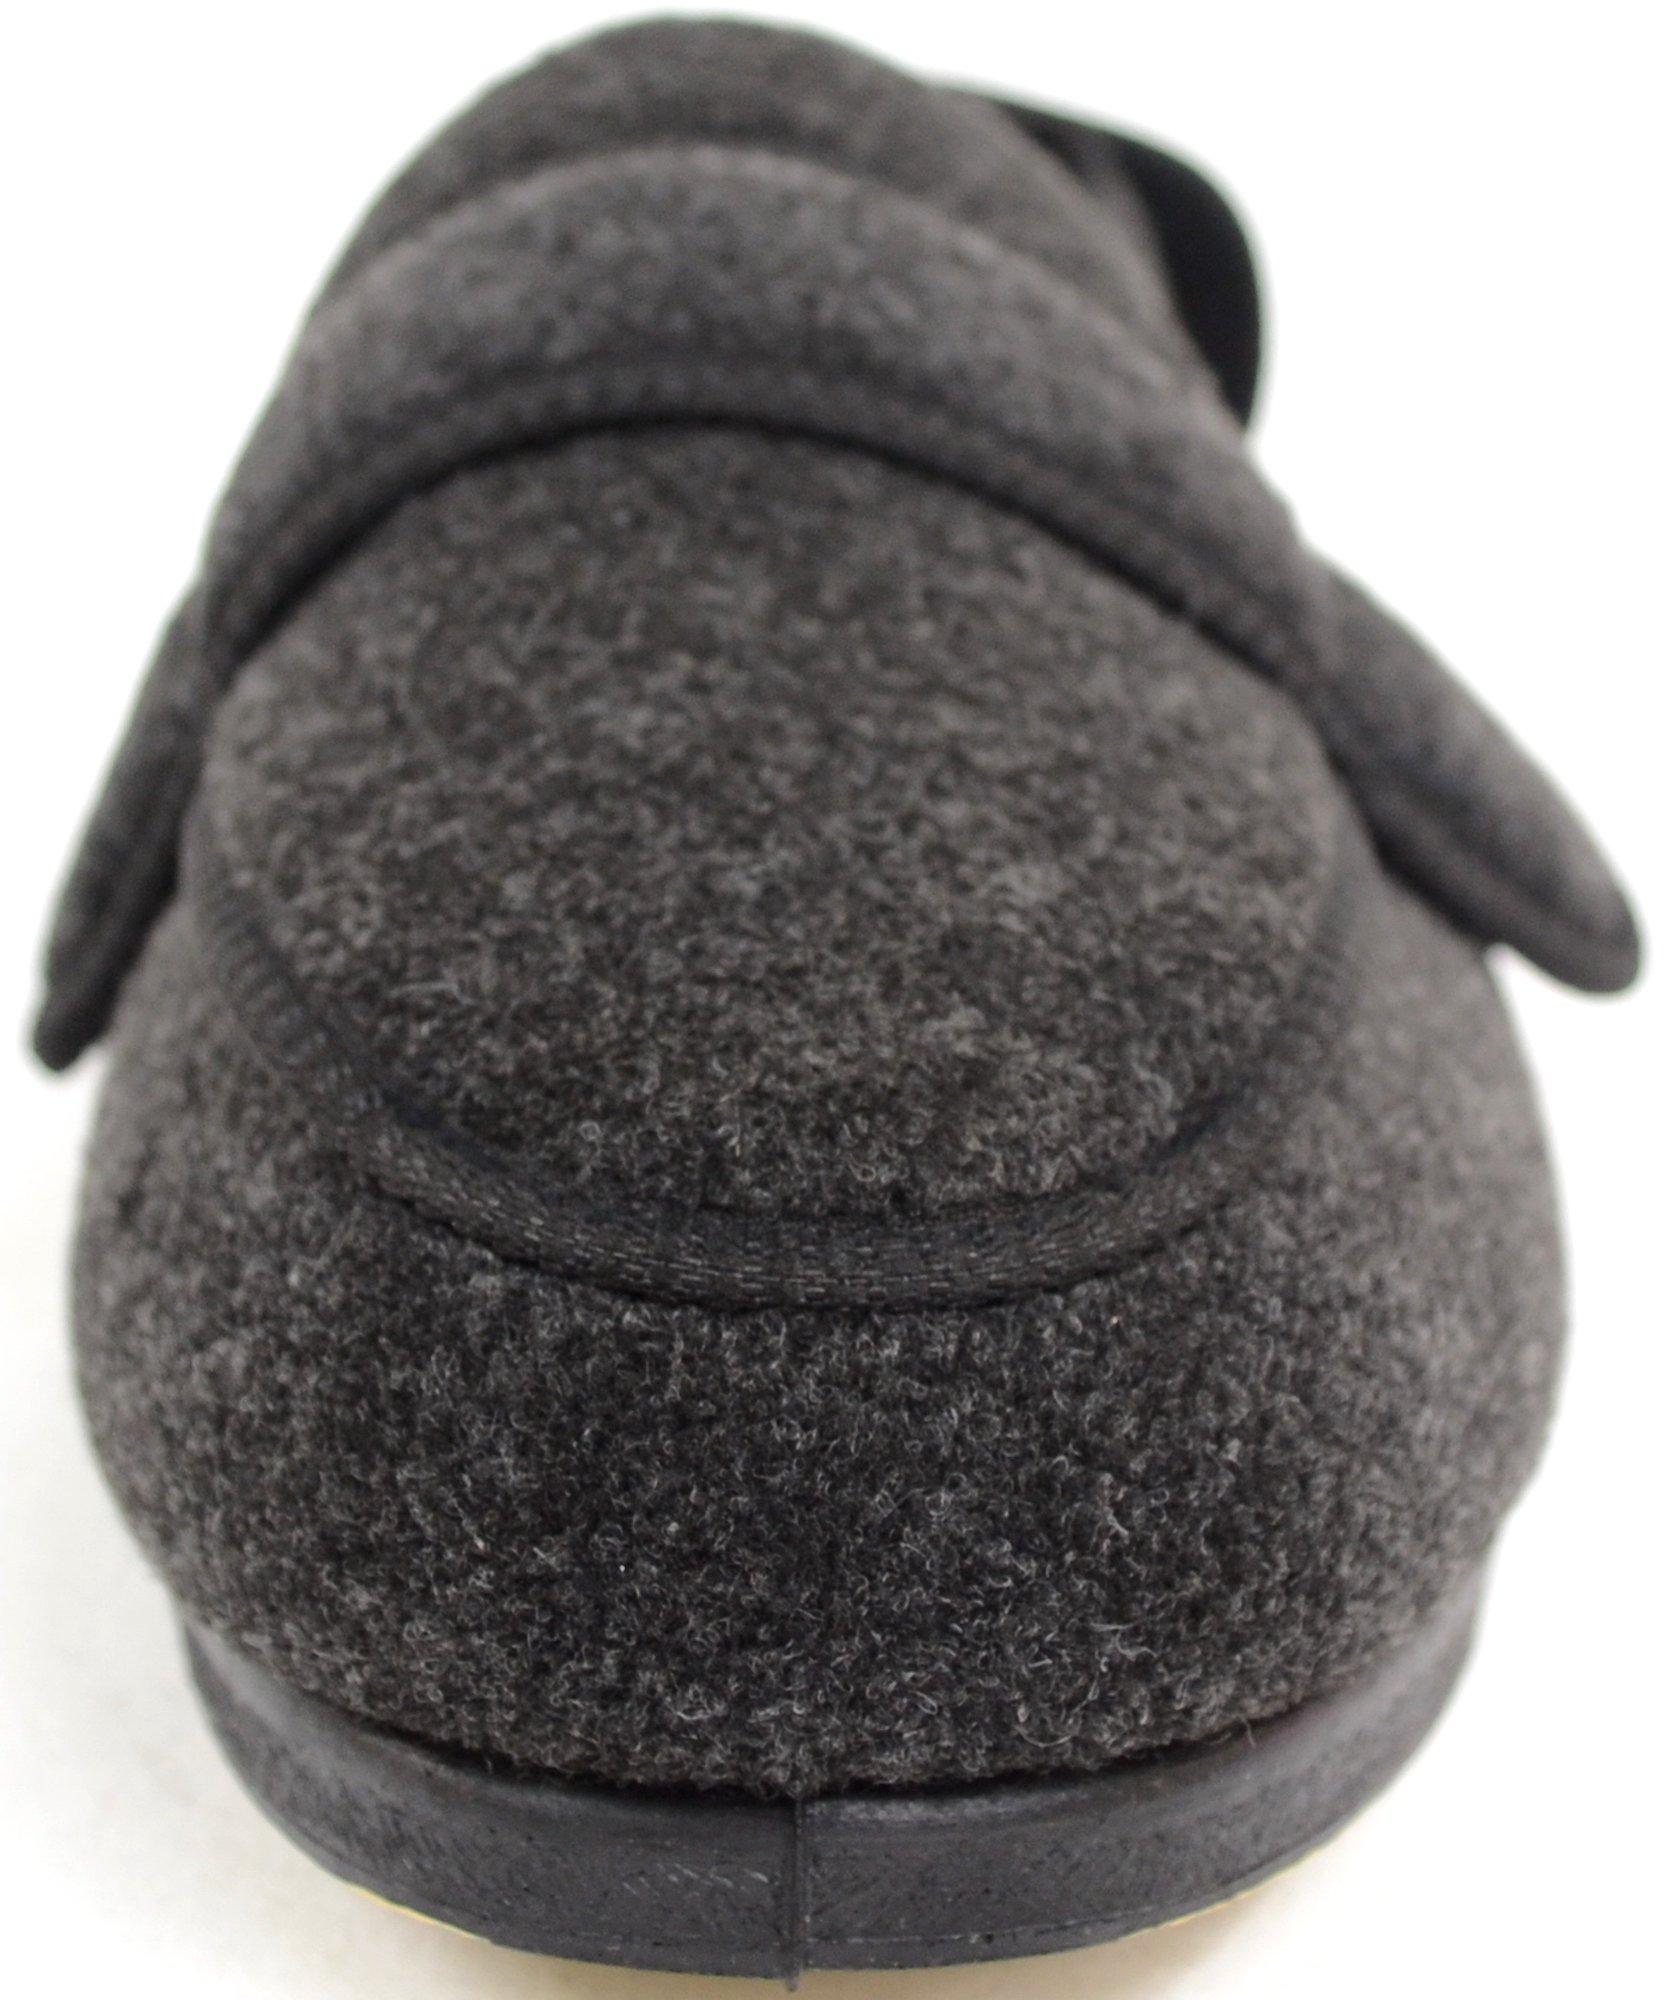 ABSOLUTE FOOTWEAR Mens Orthopaedic/Extra Wide Fit Adjustable Slipper Boot/Slippers - Grey - 10 US by ABSOLUTE FOOTWEAR (Image #2)